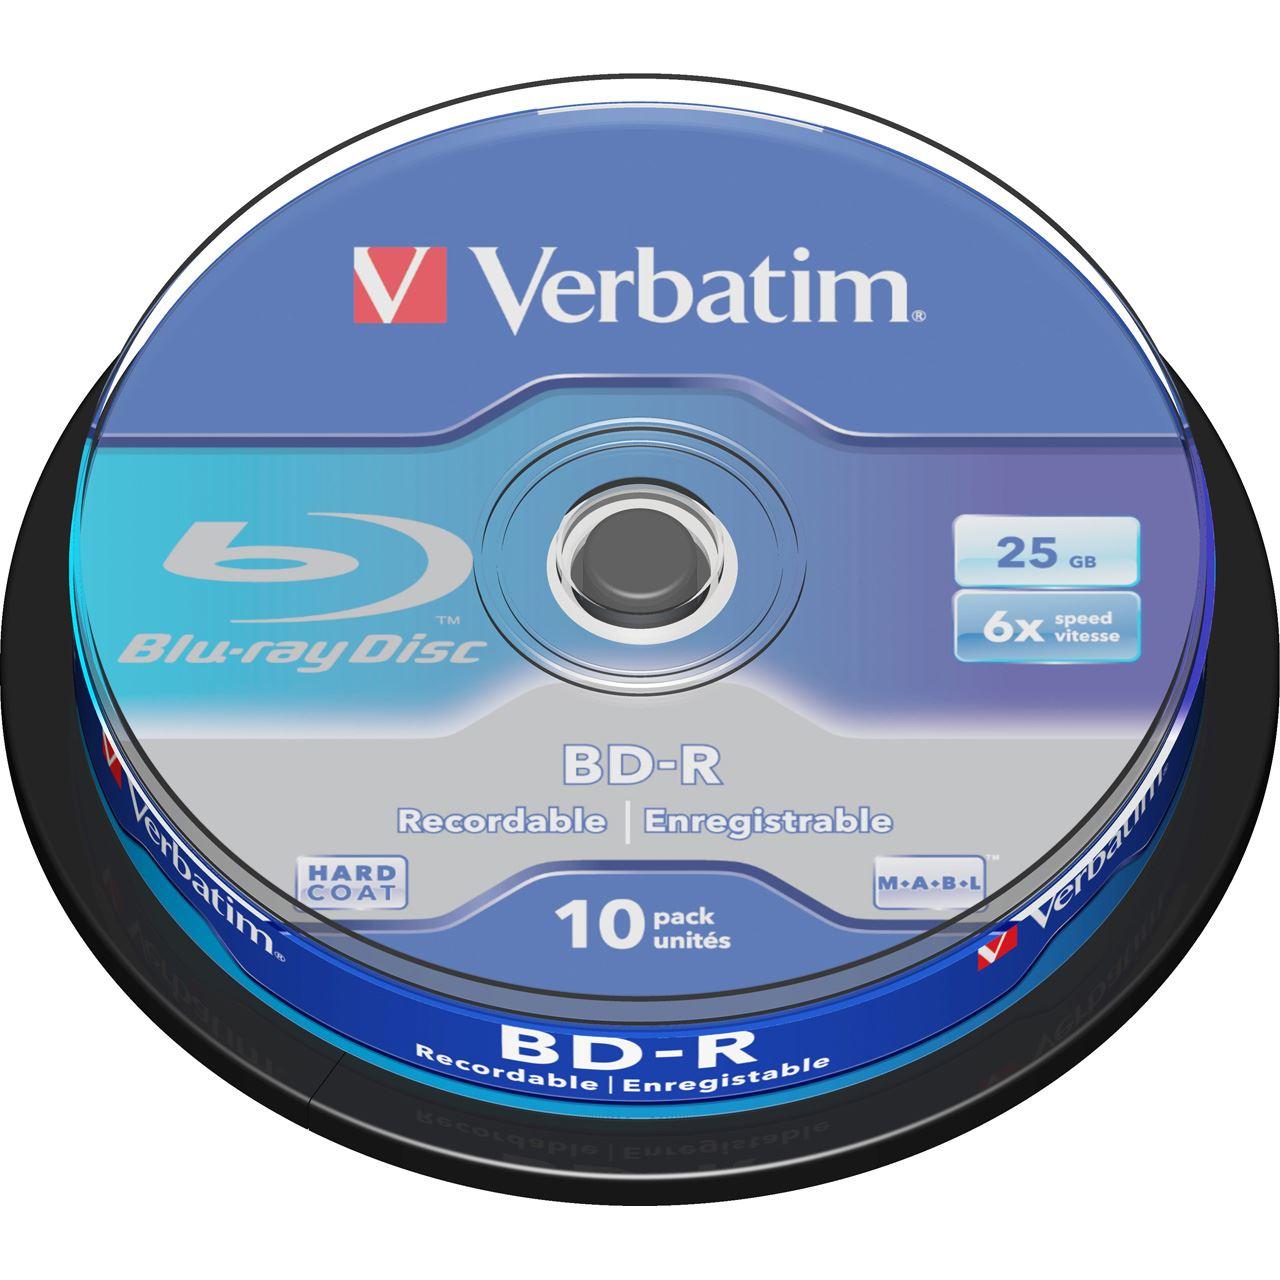 Verbatim Blu-ray Disc BD-R 25GB 6x 10 Τεμ.σε Κωρίνα